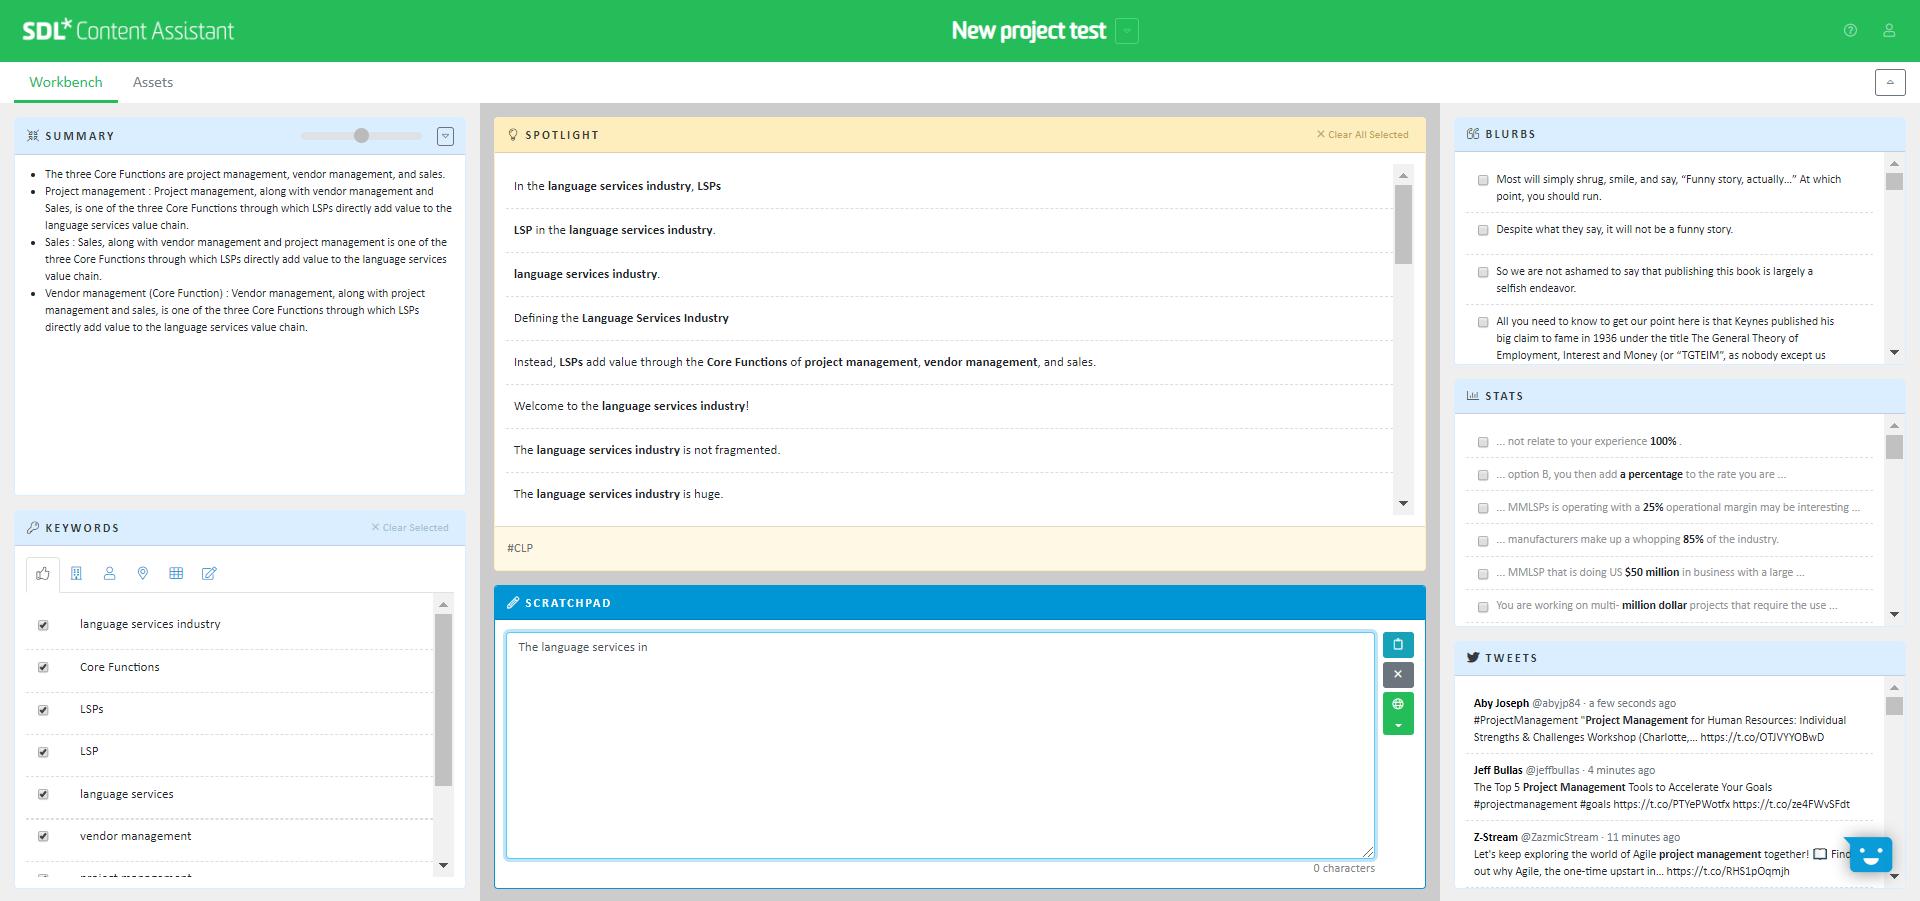 Nimdzi Analyzes the SDL Content Assistant Tool 01